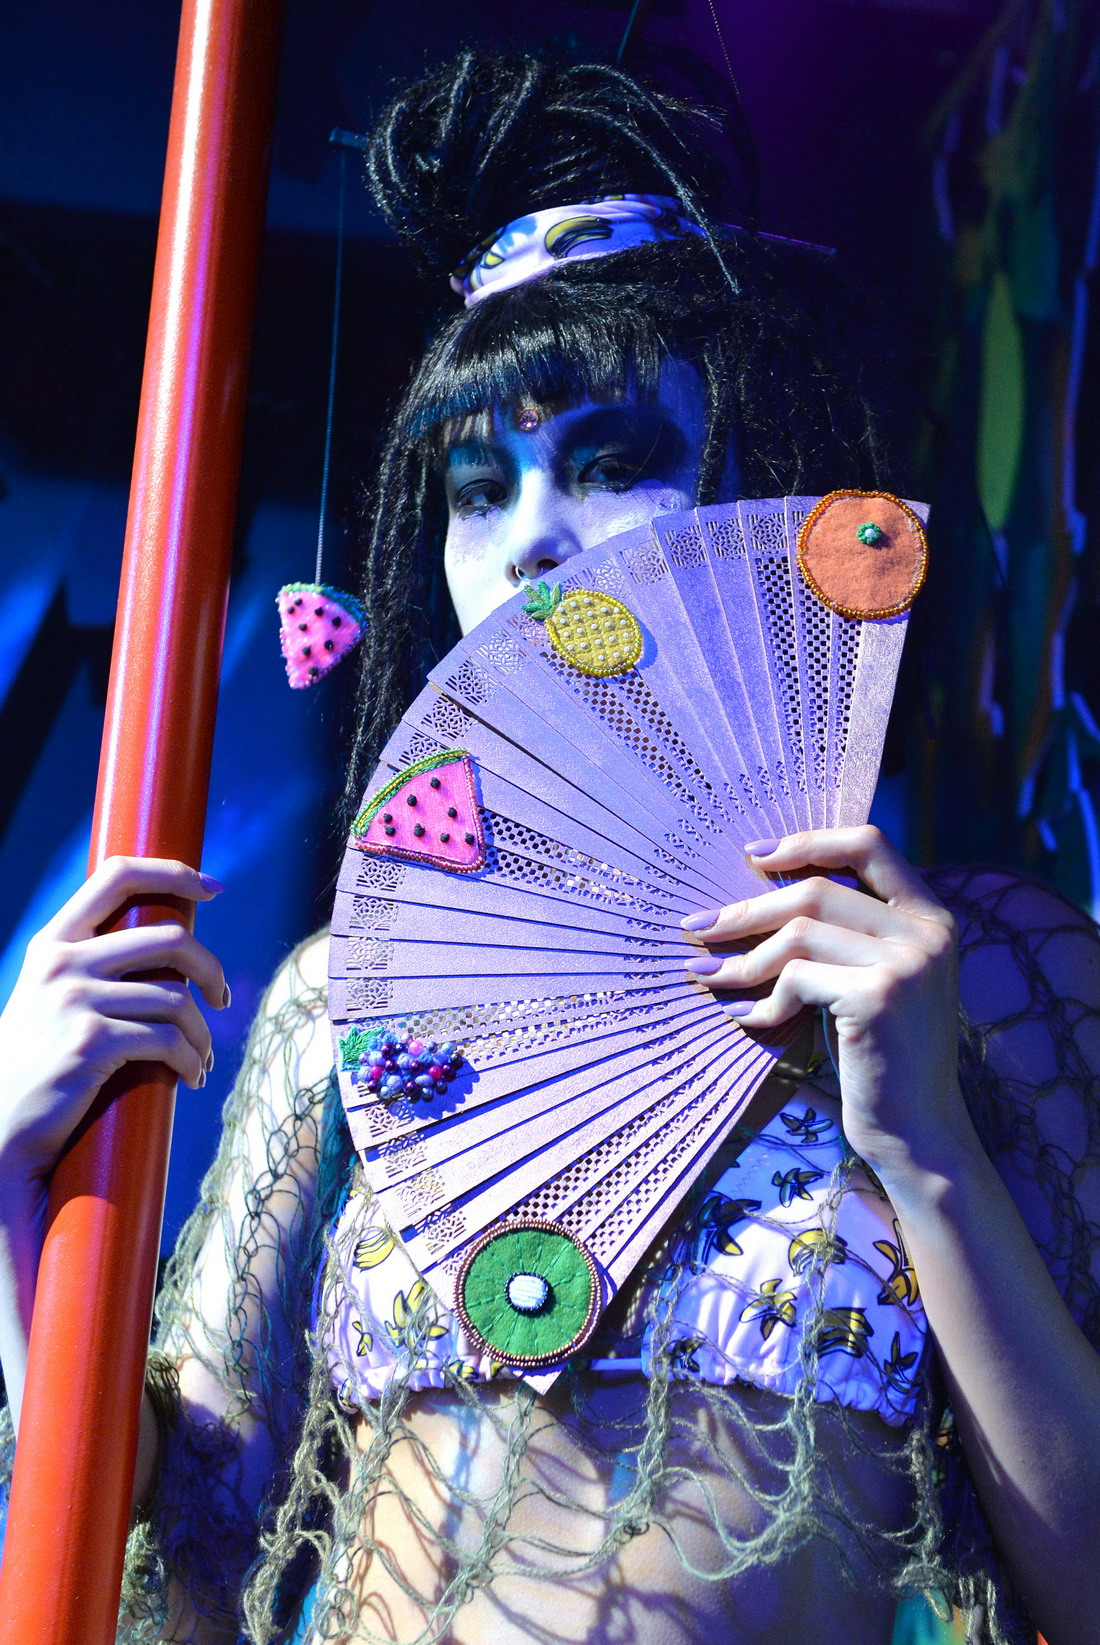 Модели Get Wild at London Fashion Week 2015